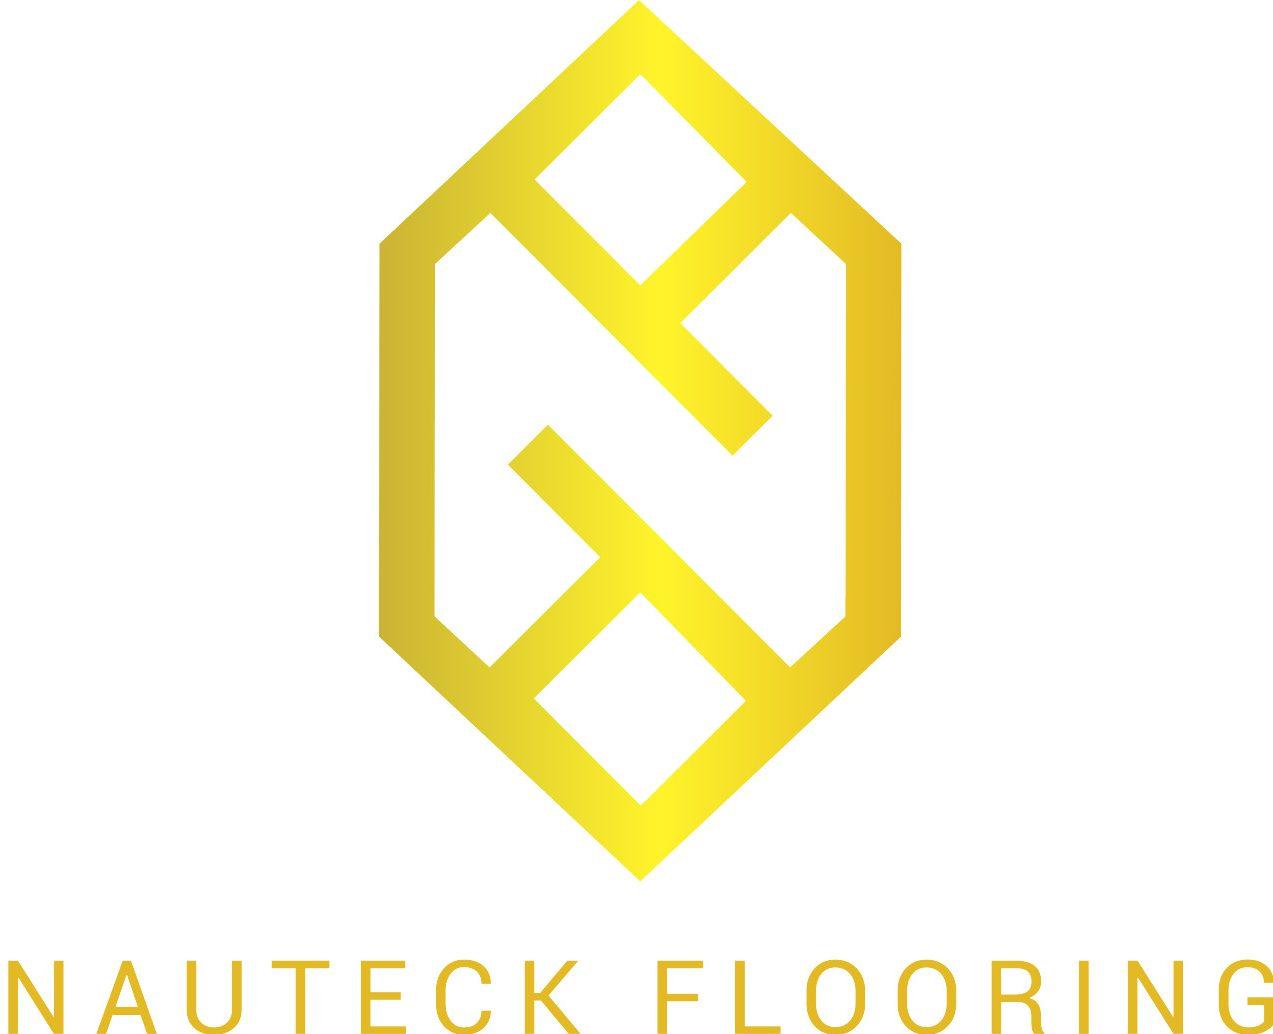 Nauteck Flooring